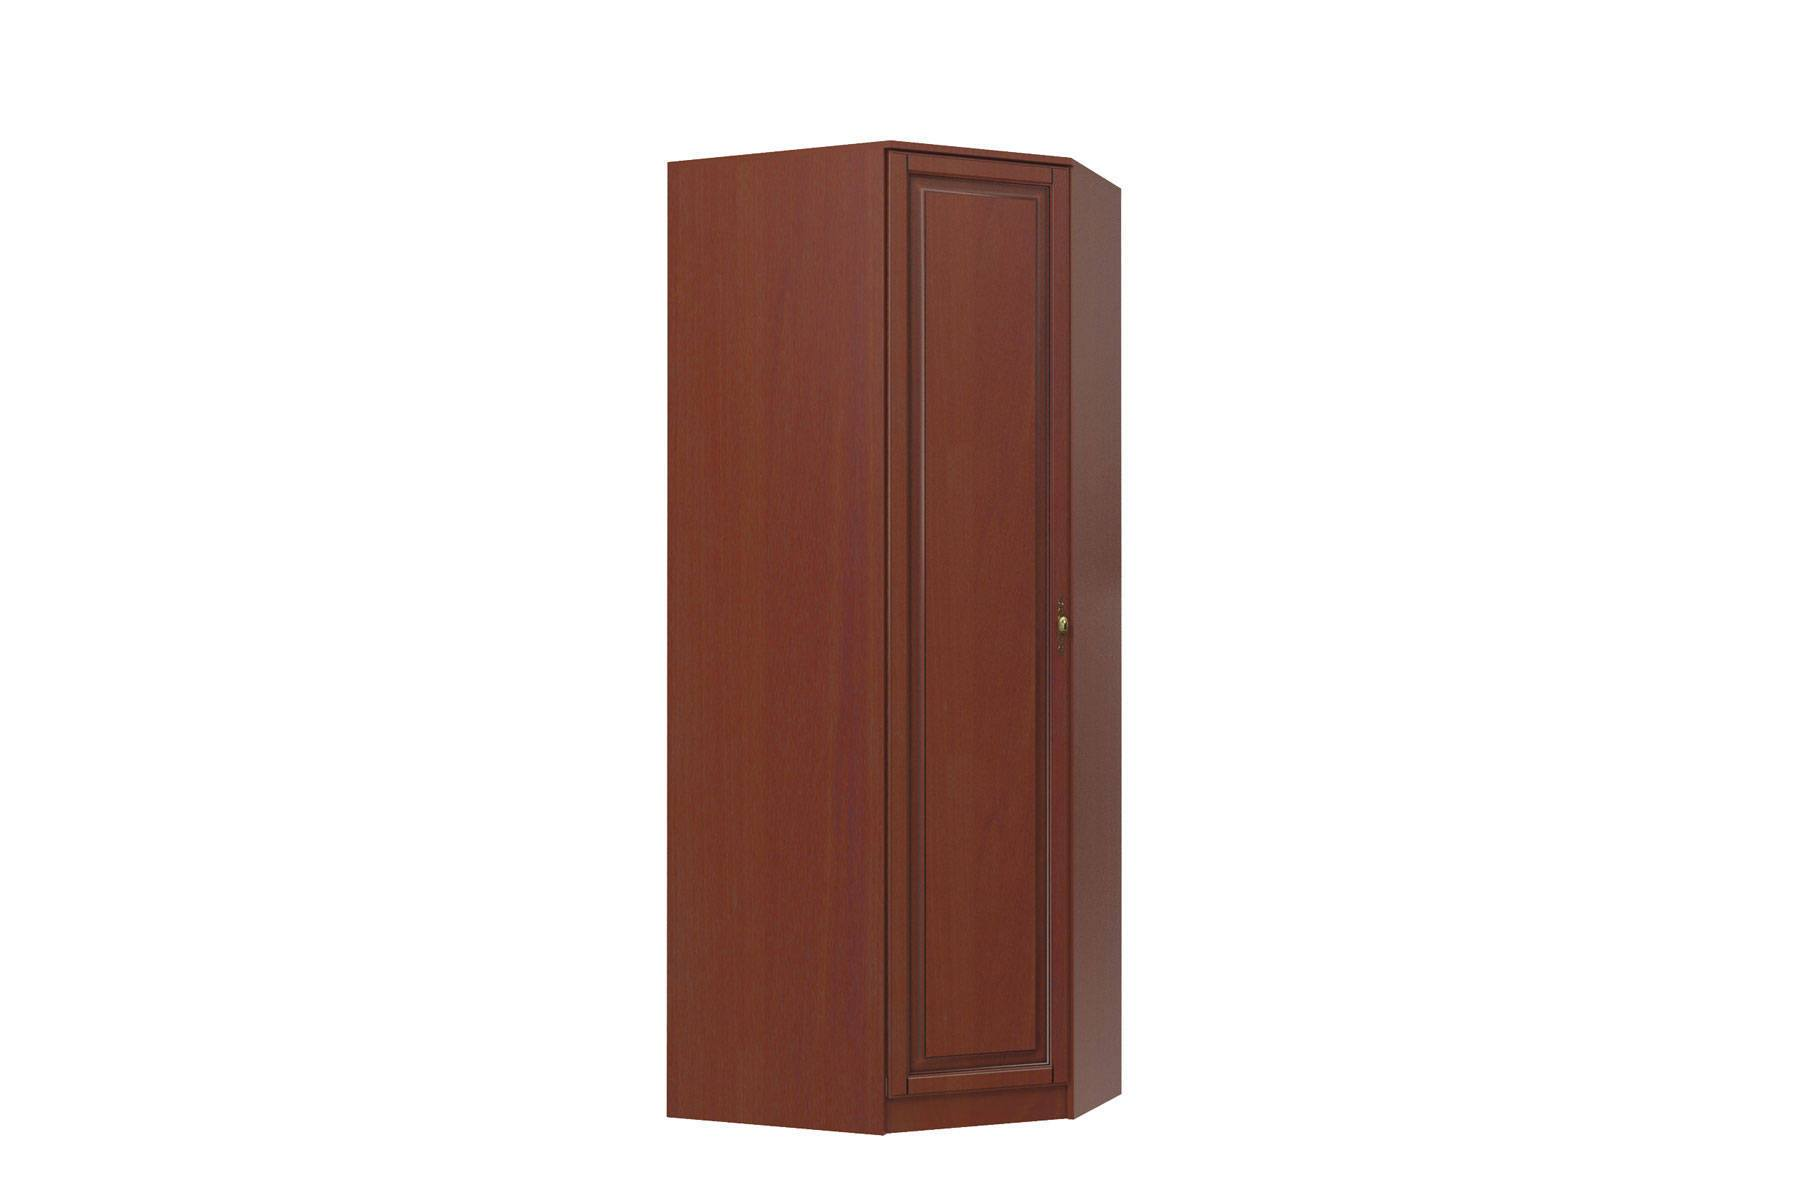 Шкаф угловой левый Влада СТЛ.040.17